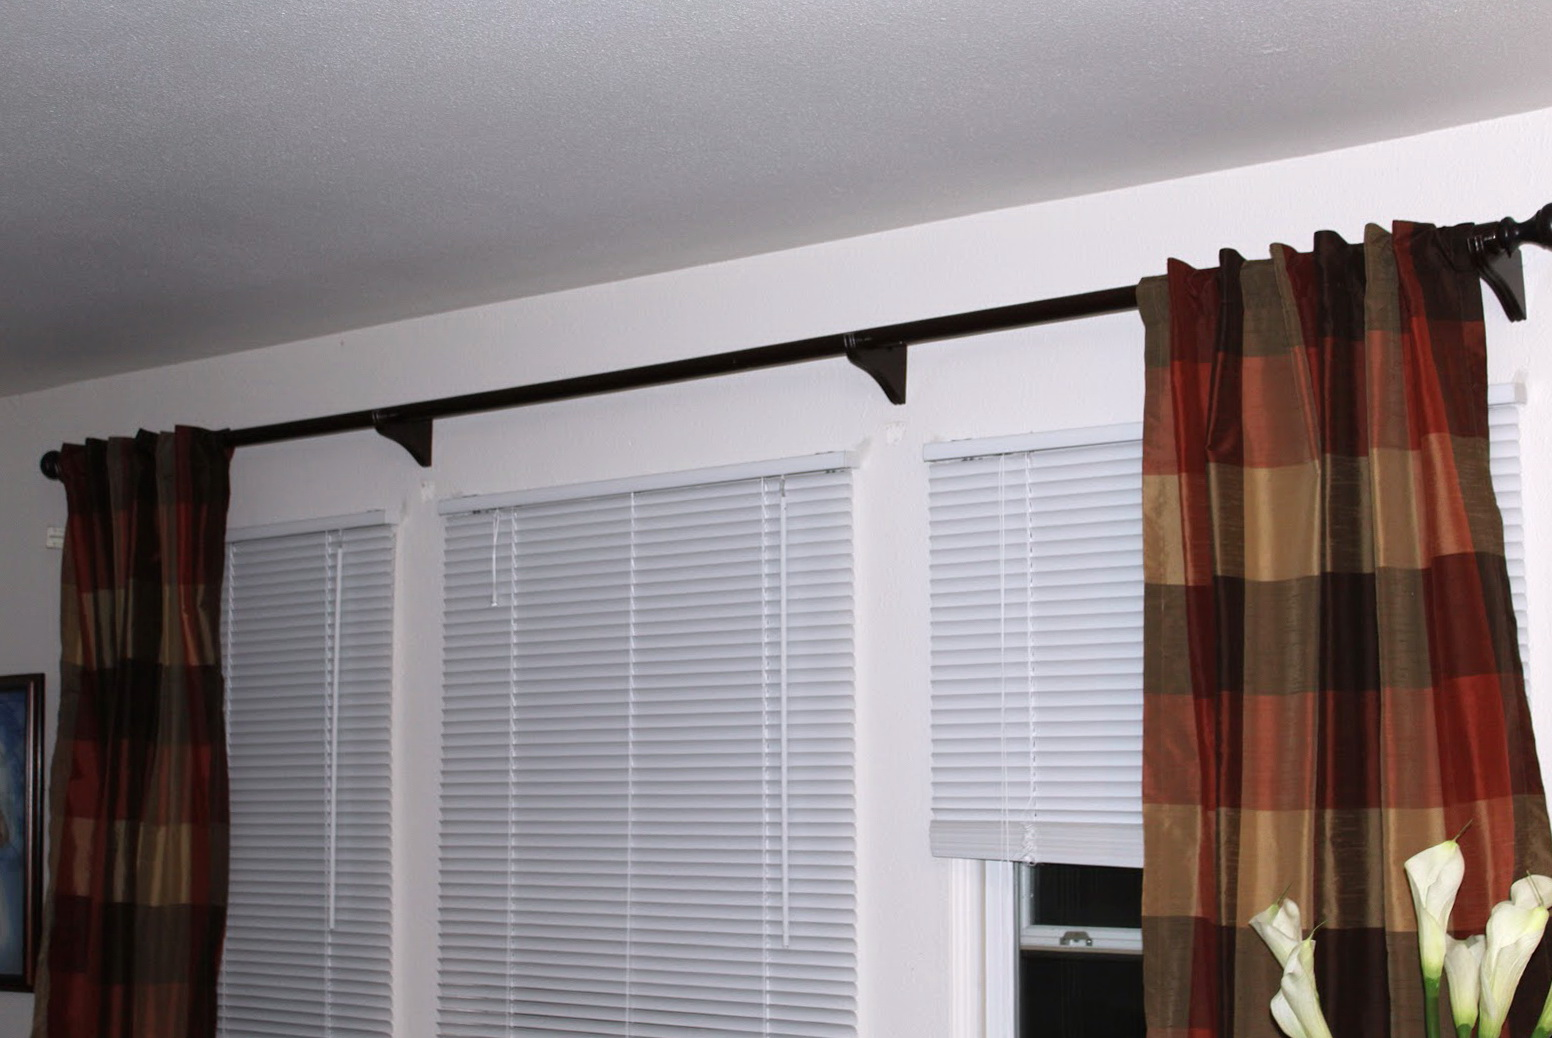 Inside Mount Curtain Rod Home Depot Home Design Ideas